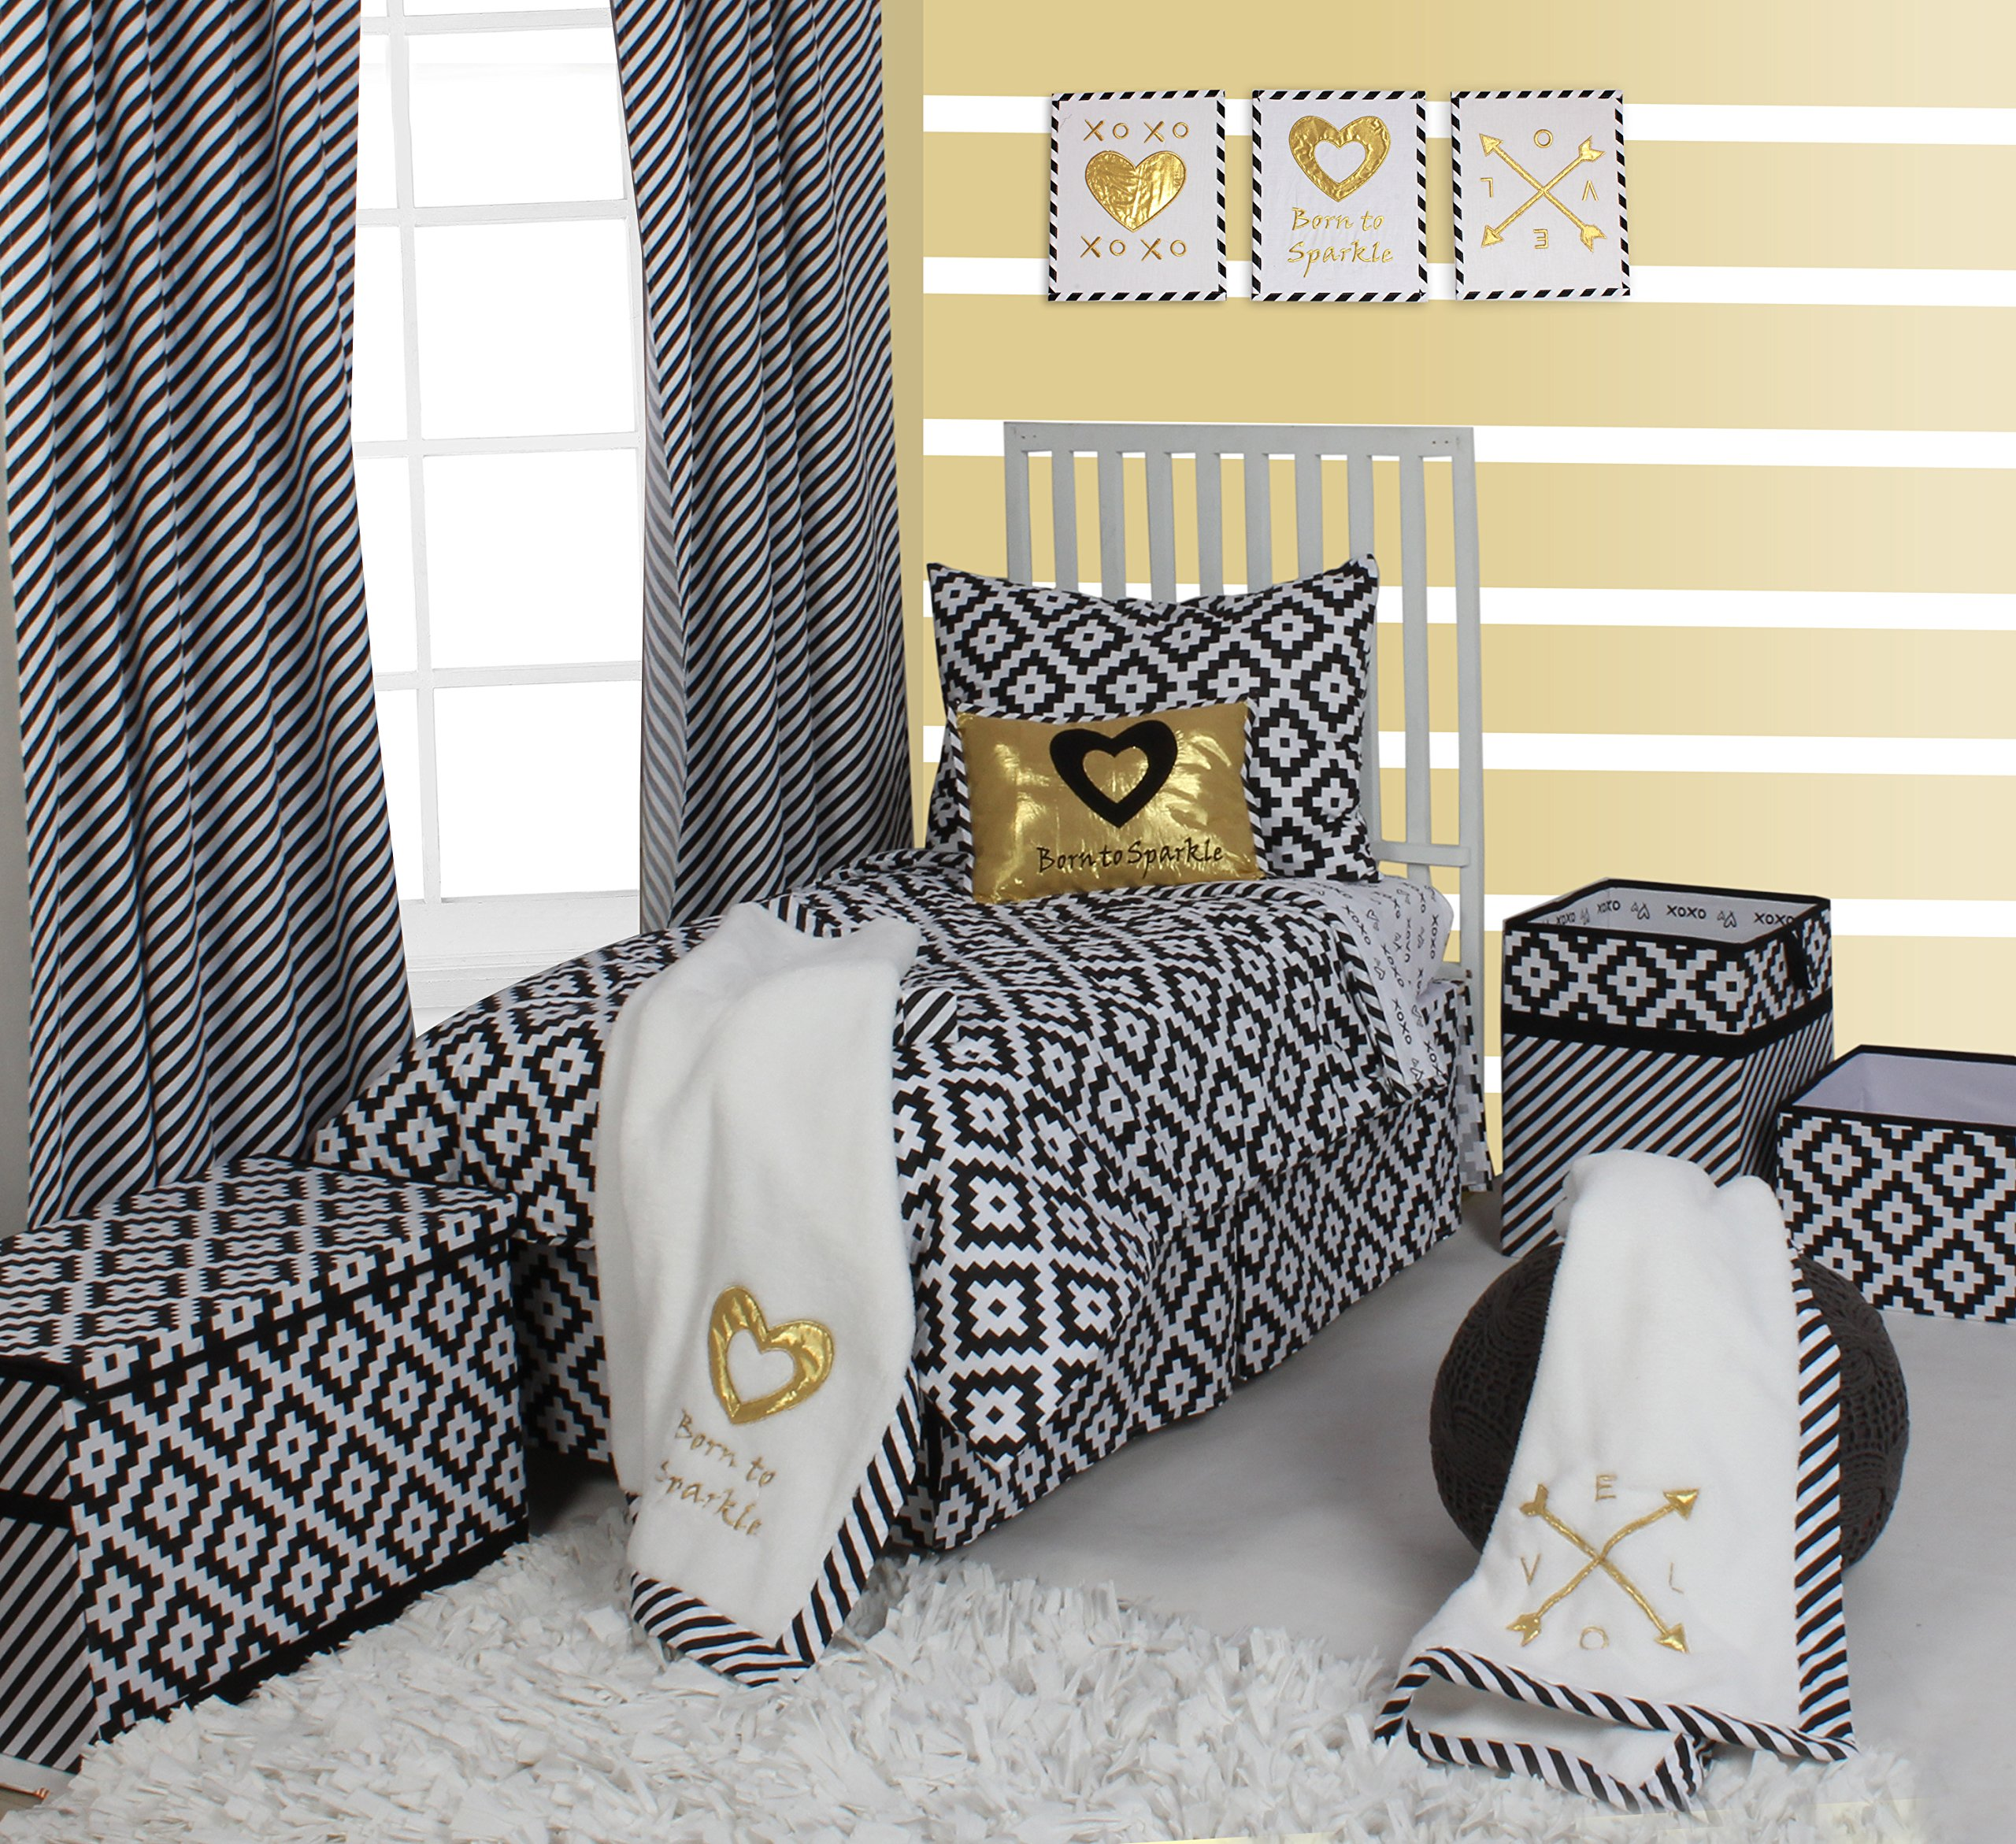 Bacati Love Unisex 4 Piece Toddler Bedding Set, Black/White